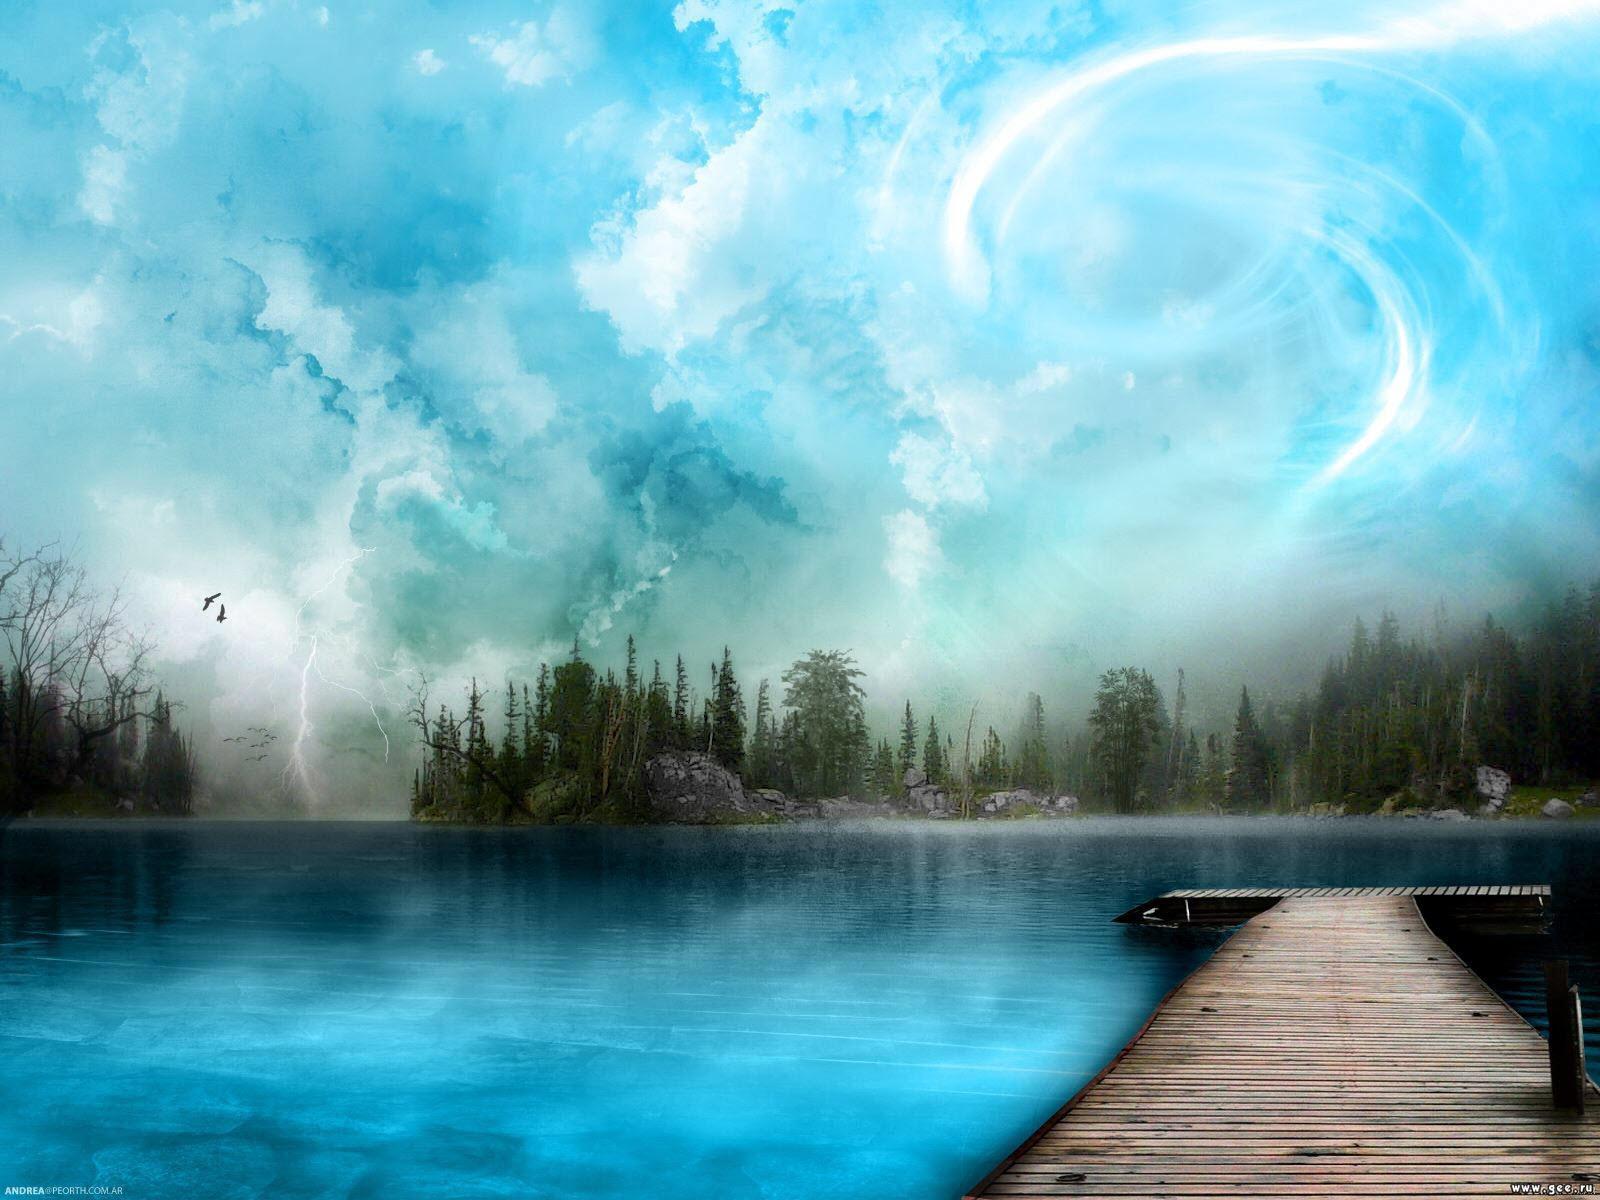 pont illustration décor bleu